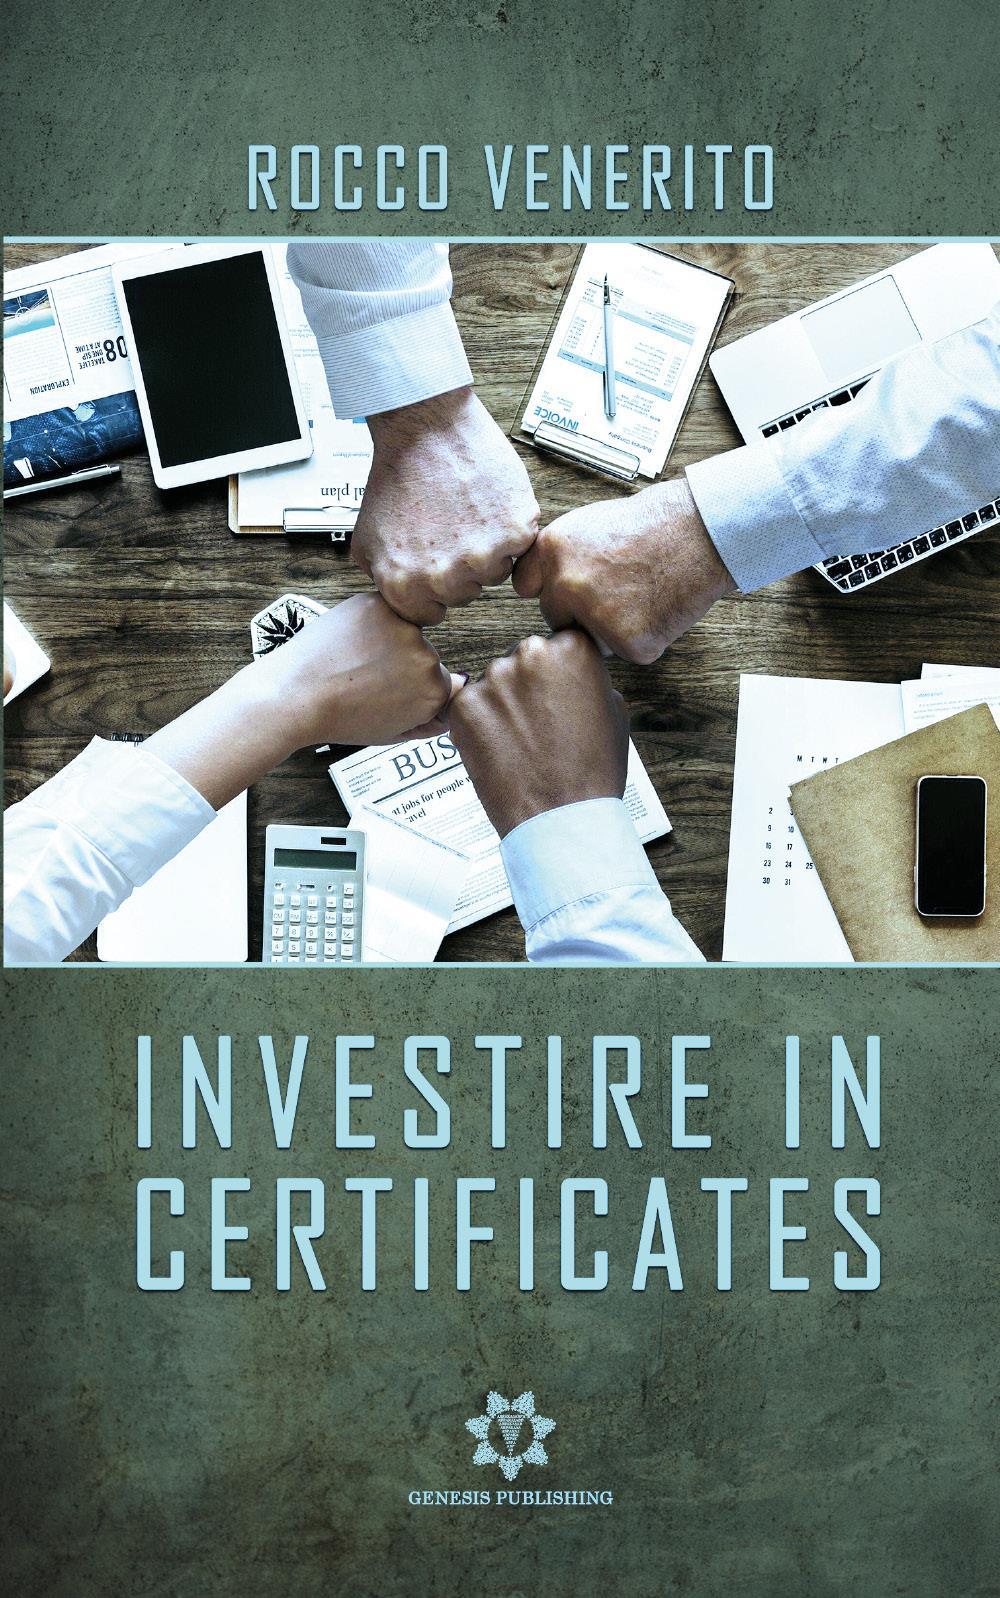 Investire in Certificates